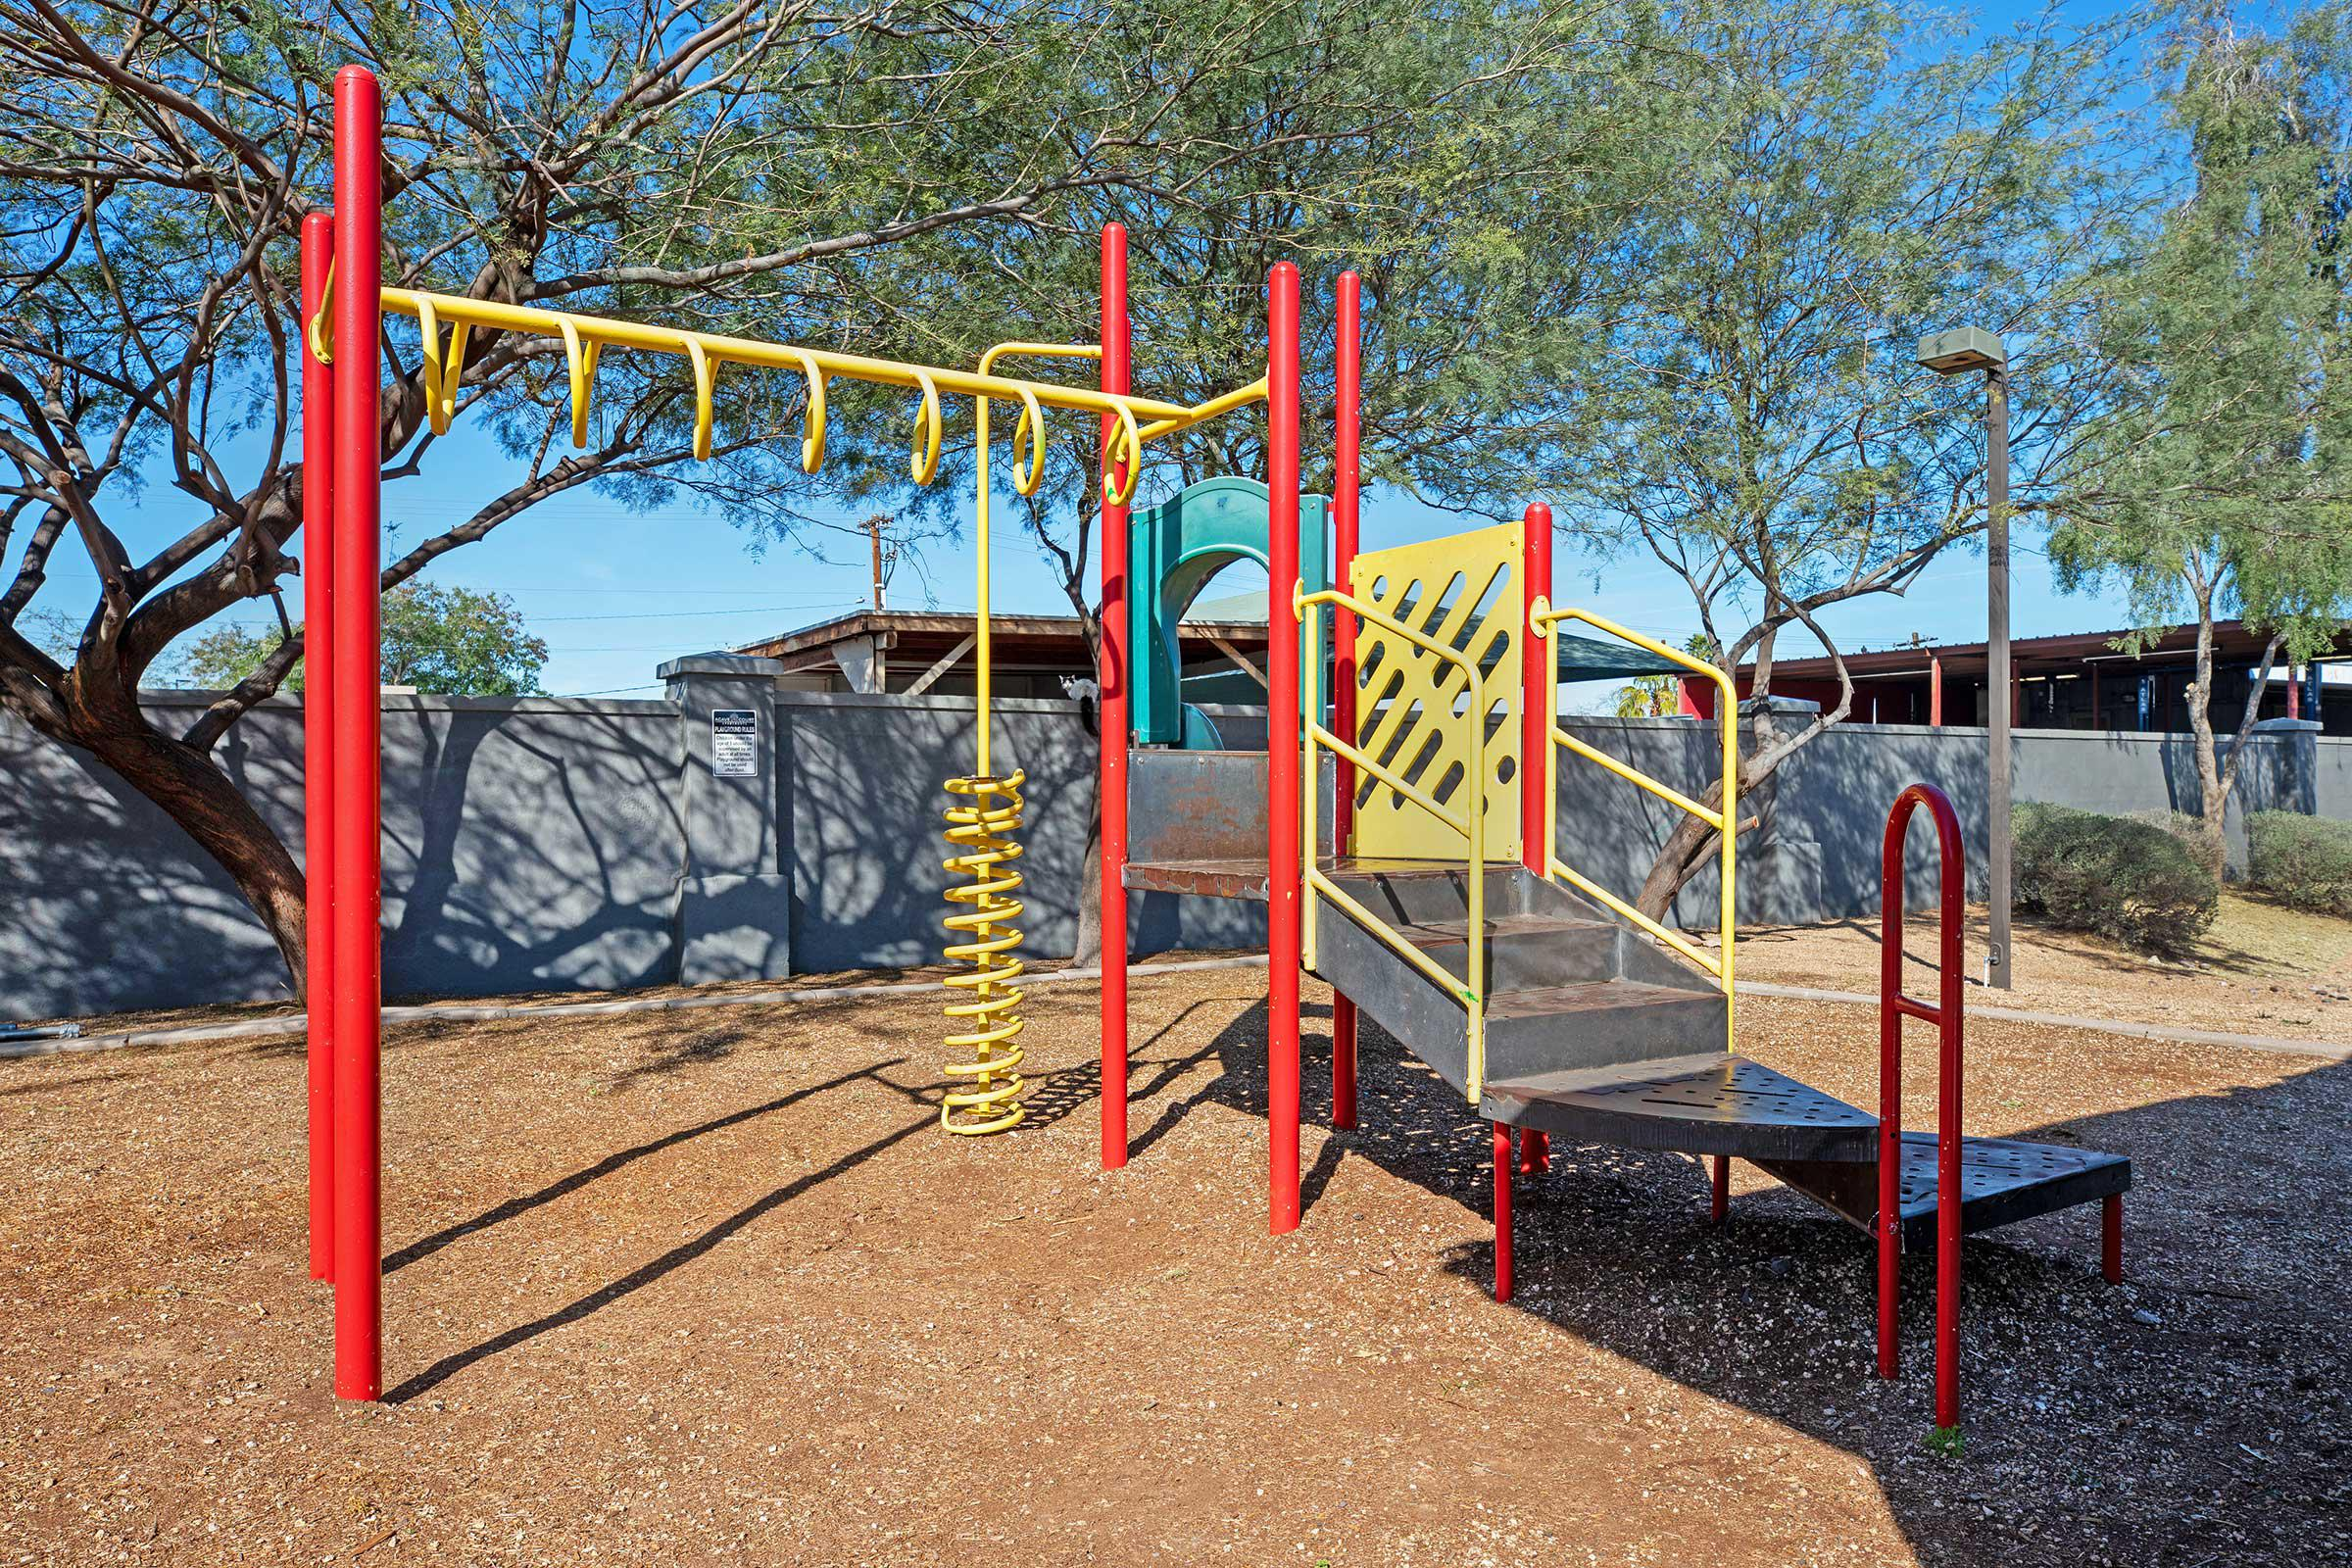 a playground inside a fence